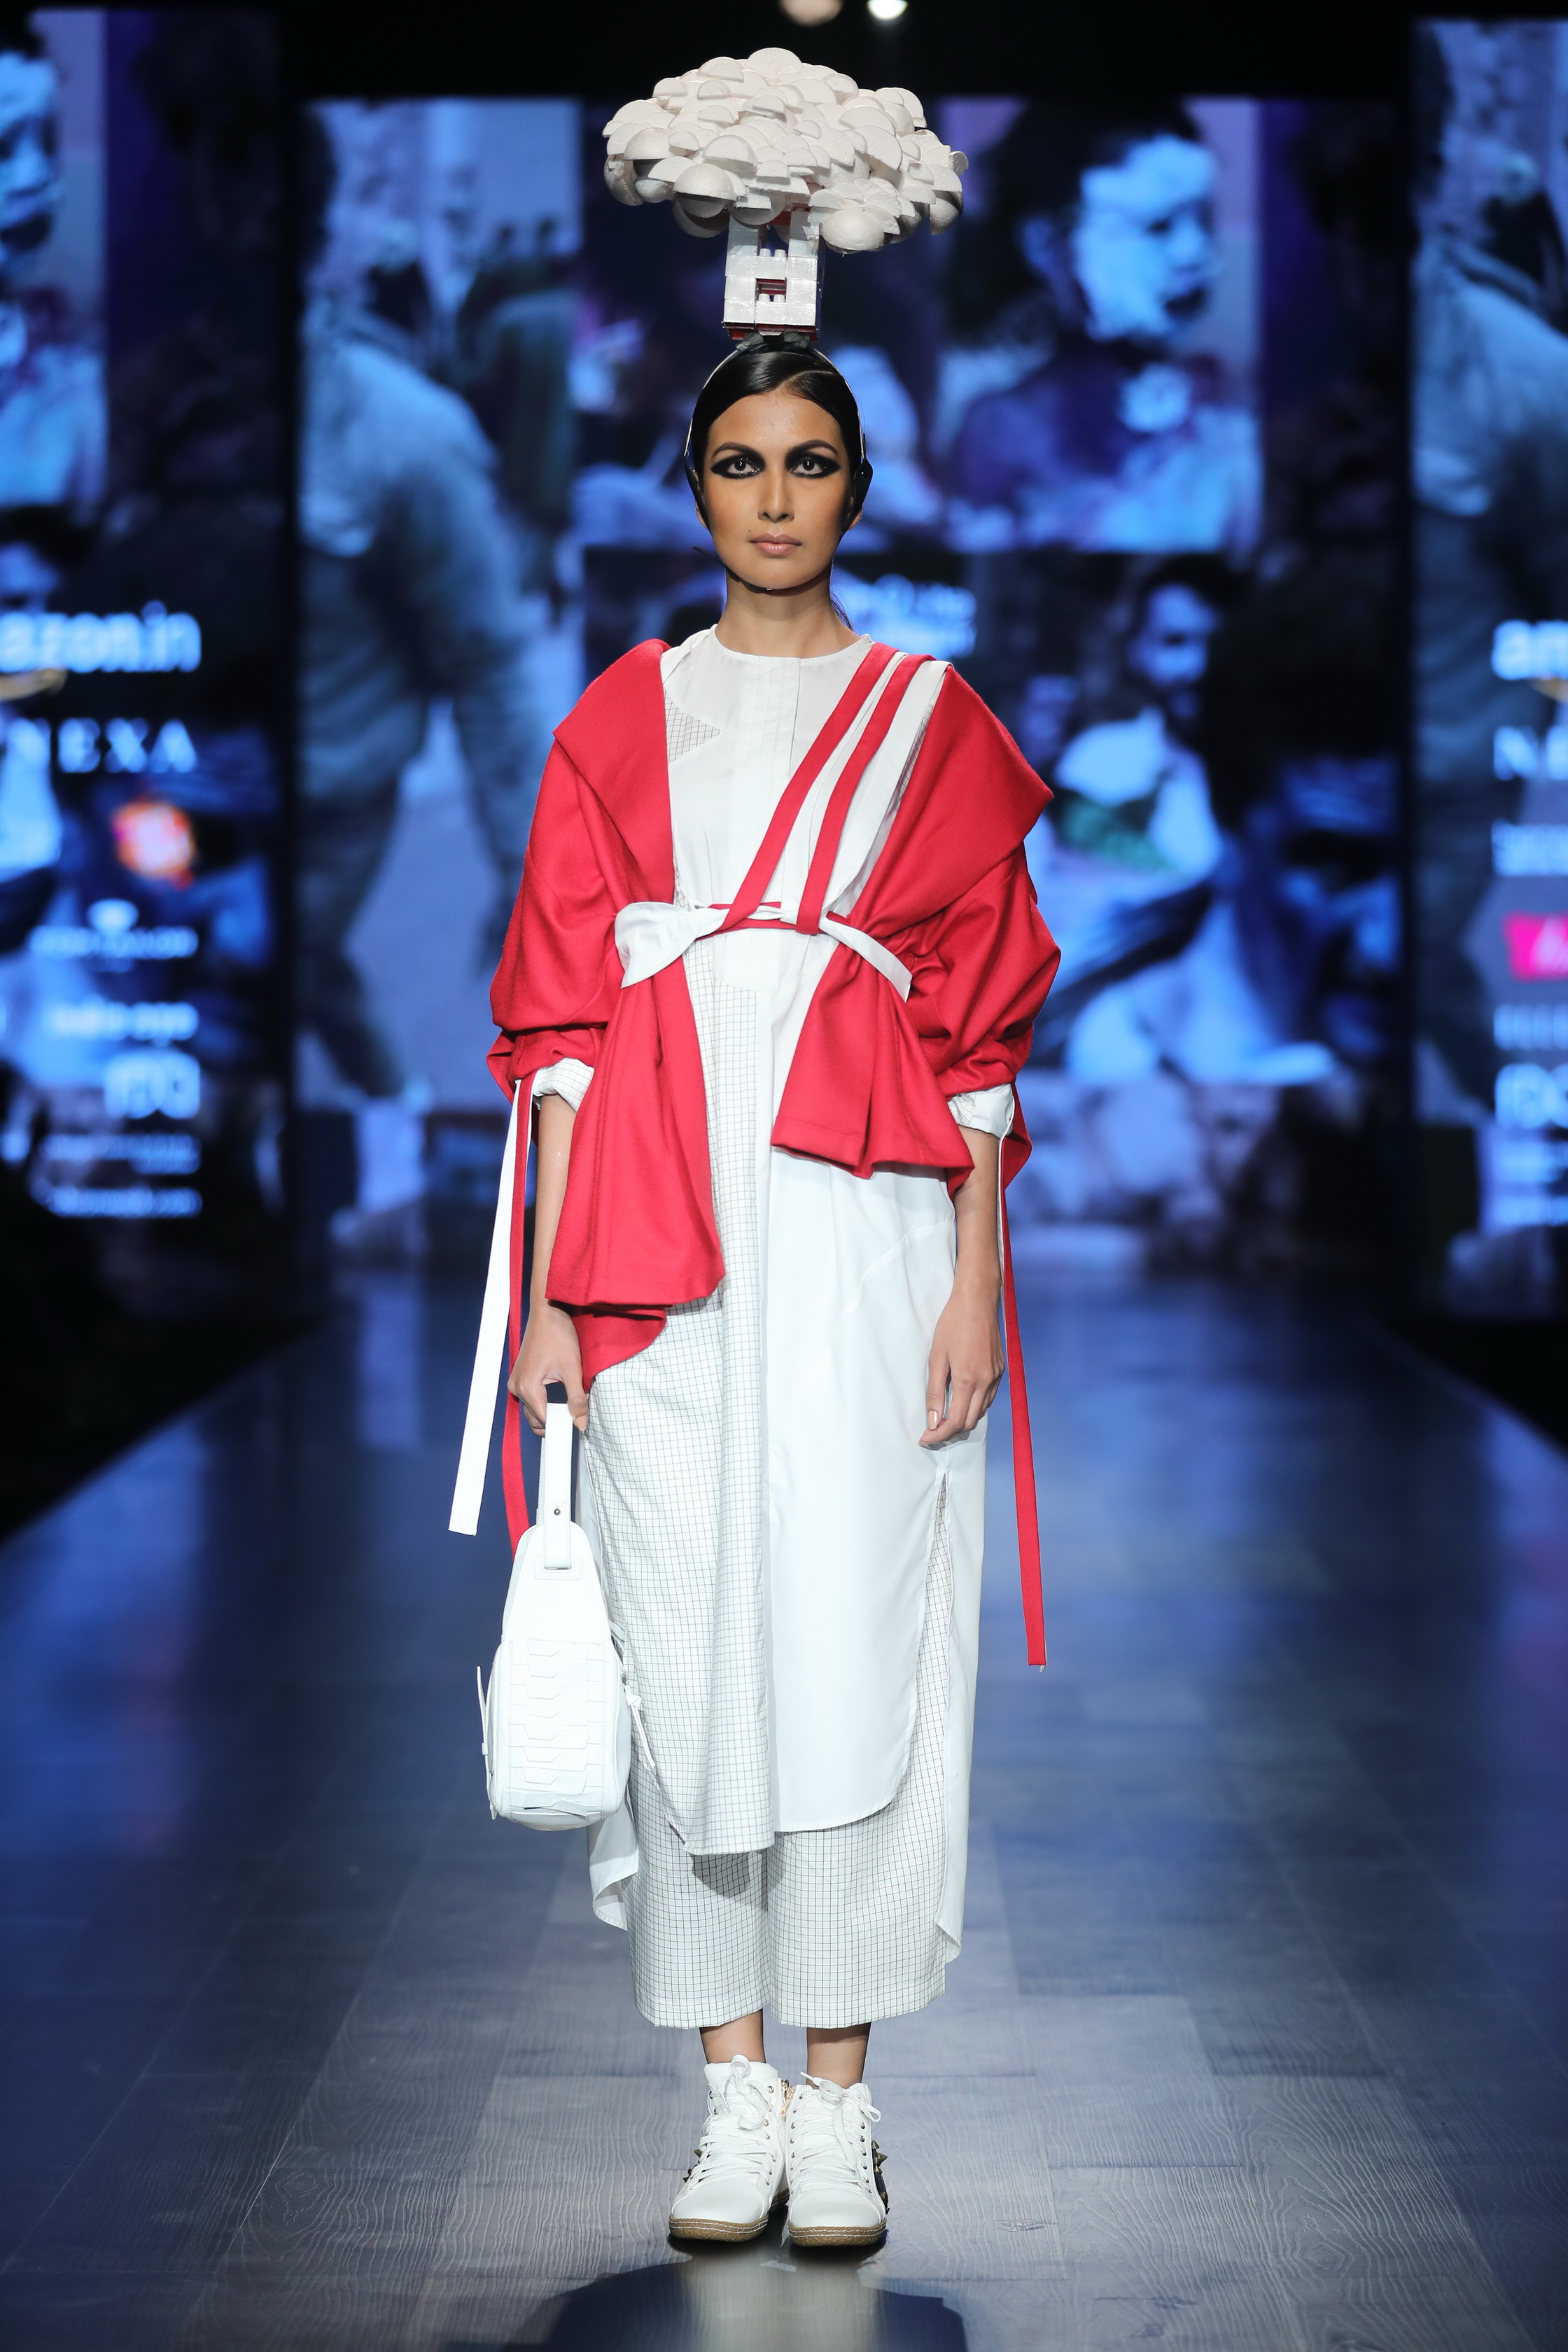 Honor 9 Lite Presents Nitin Bal Chauhan at FDCI Amazon India Fashion Week Autumn Winter 2018